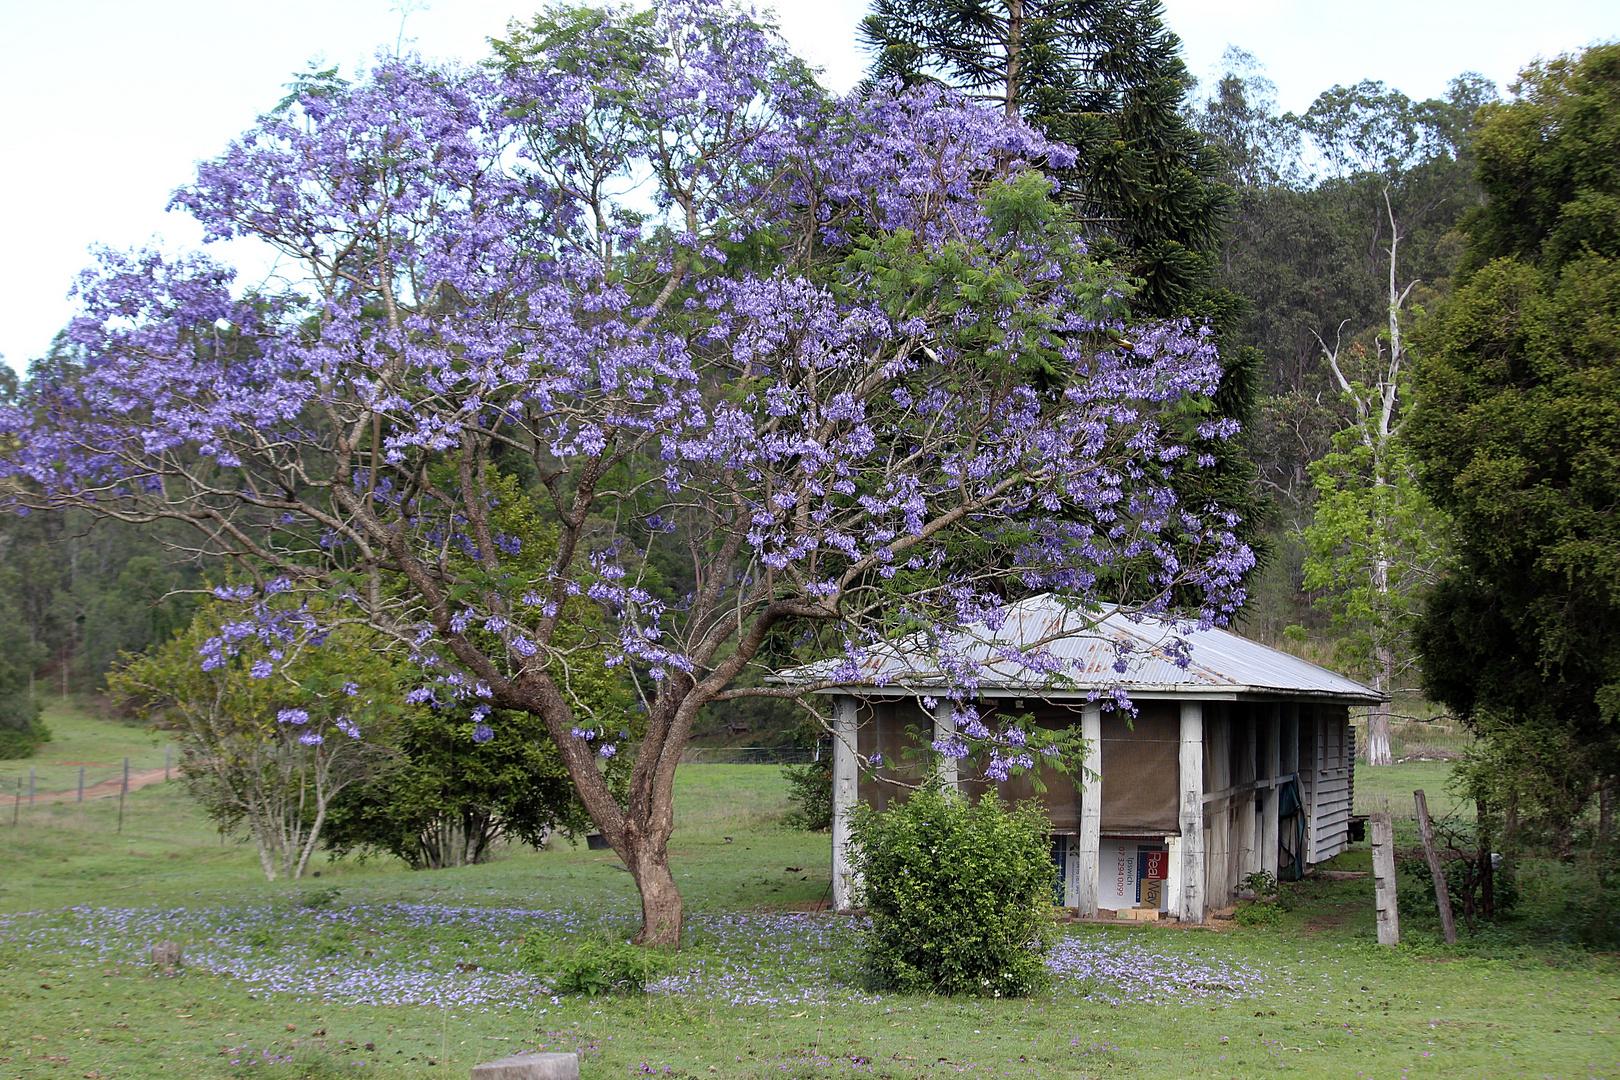 jacaranda tree and house